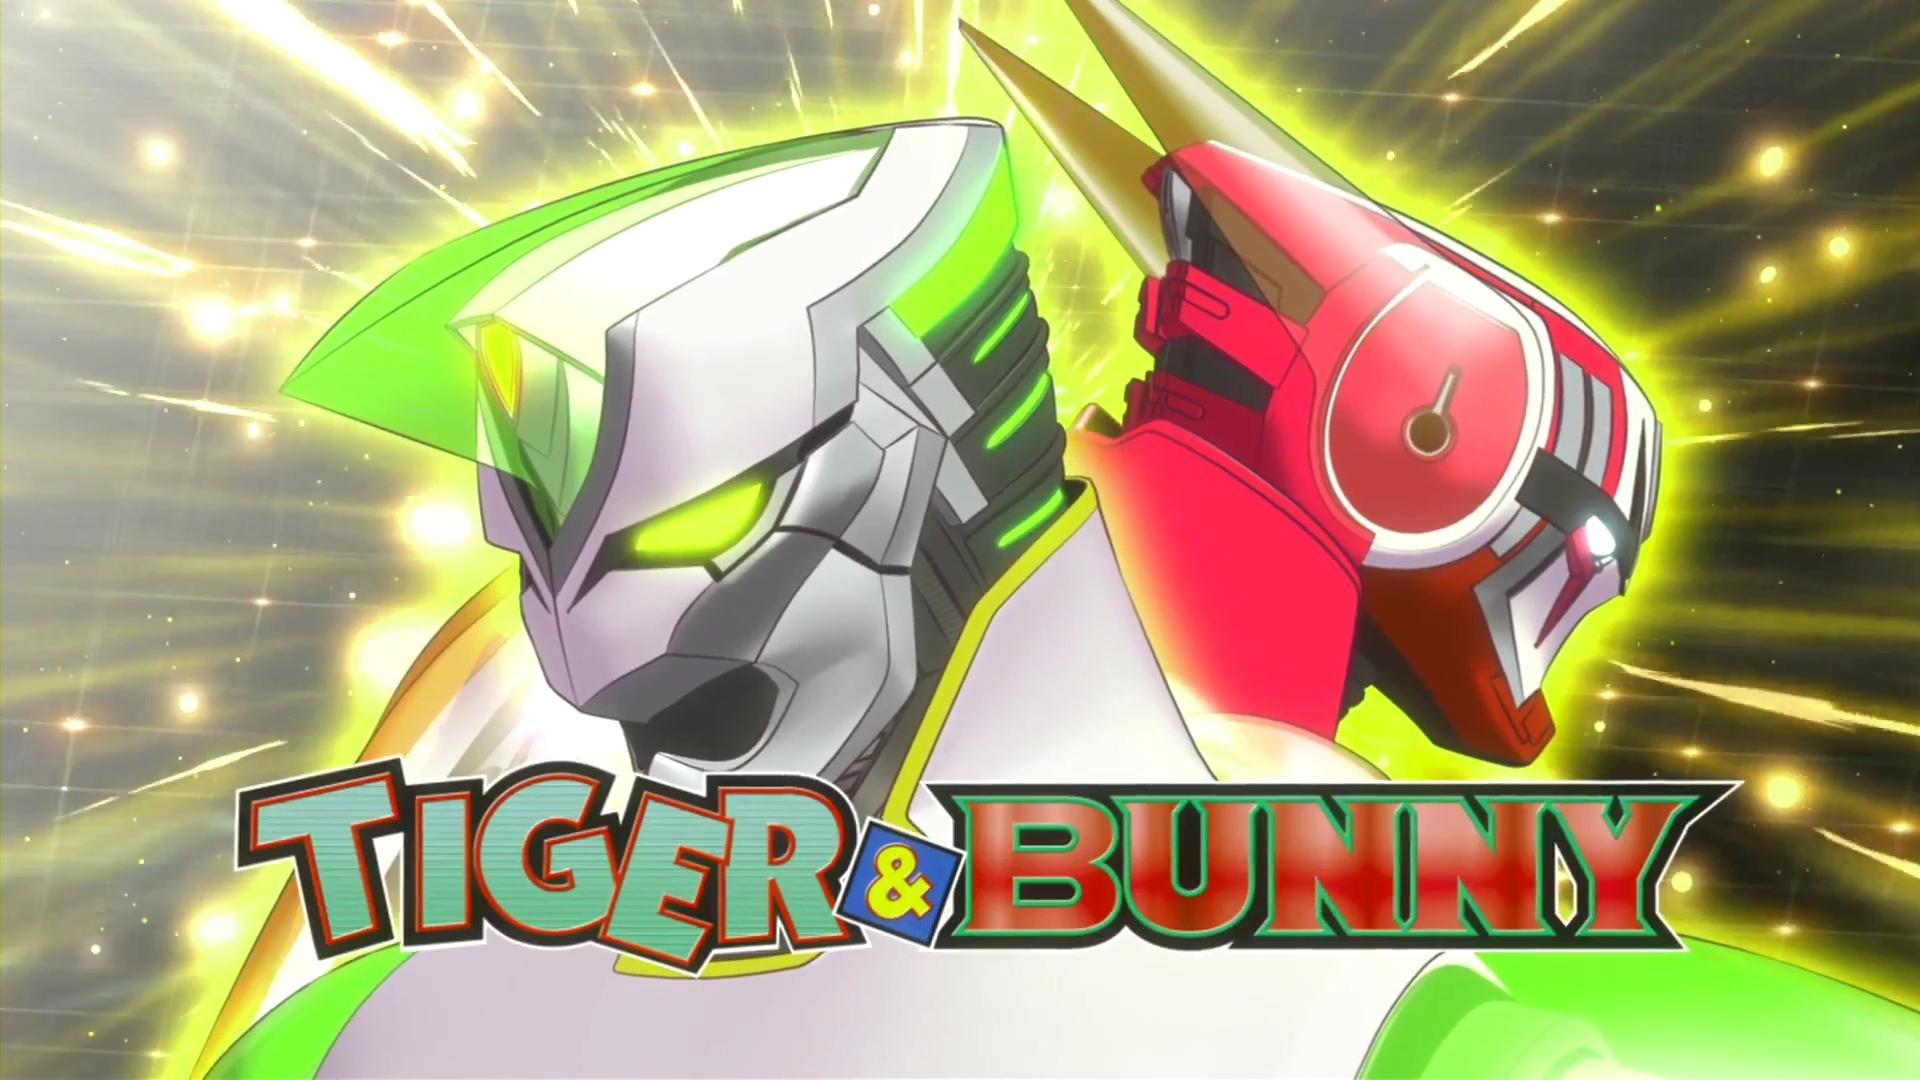 PSP『TIGER & BUNNY ~ヒーローズ デイ~』、発売日が3月20日に決定